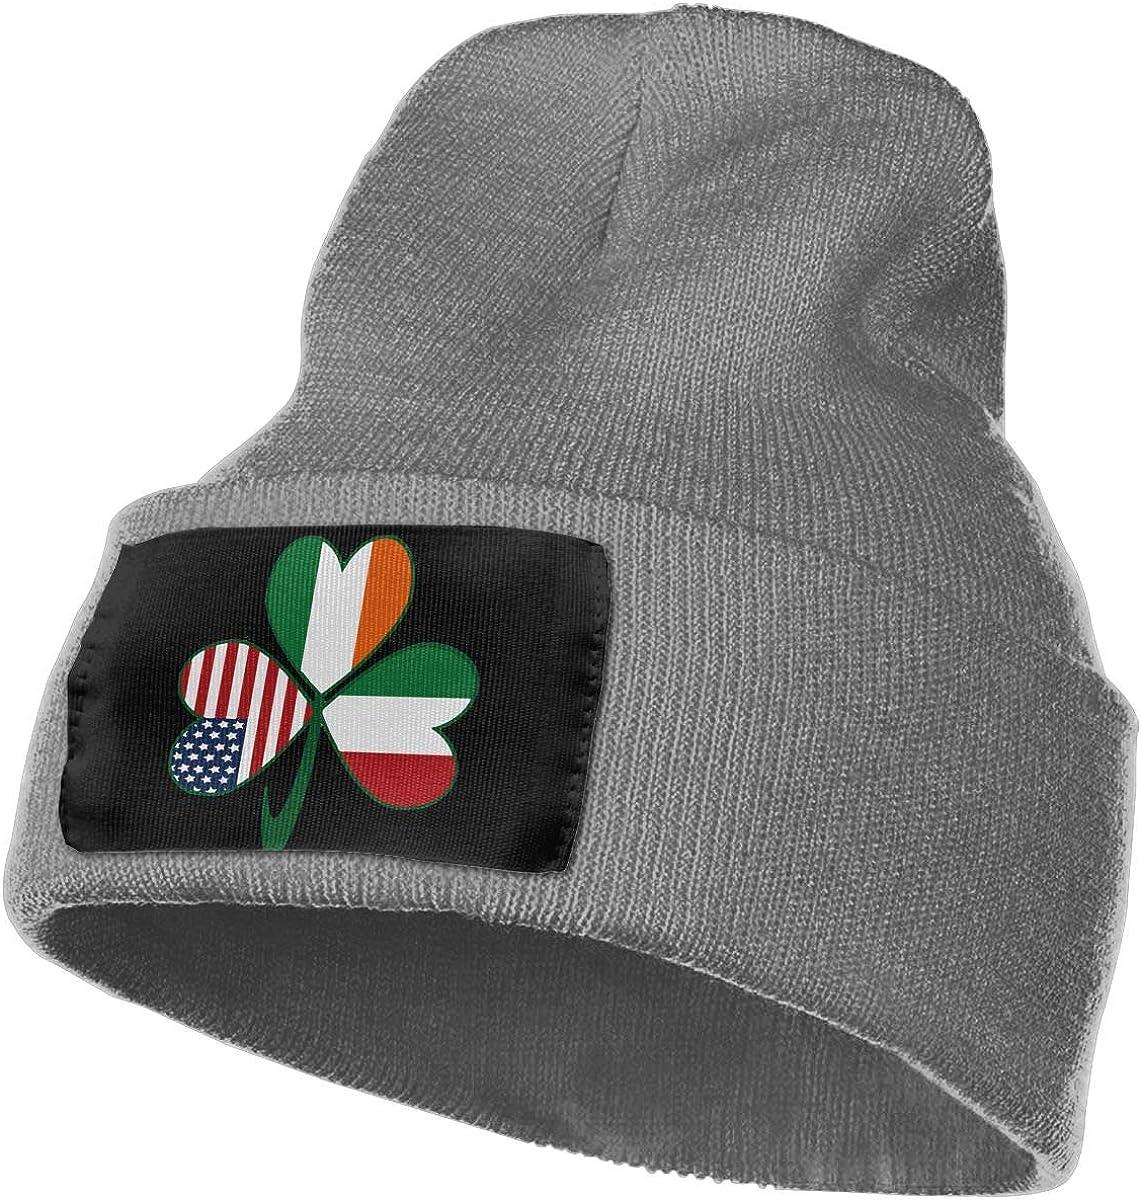 SLADDD1 Italian Irish American Shamrock Warm Winter Hat Knit Beanie Skull Cap Cuff Beanie Hat Winter Hats for Men /& Women